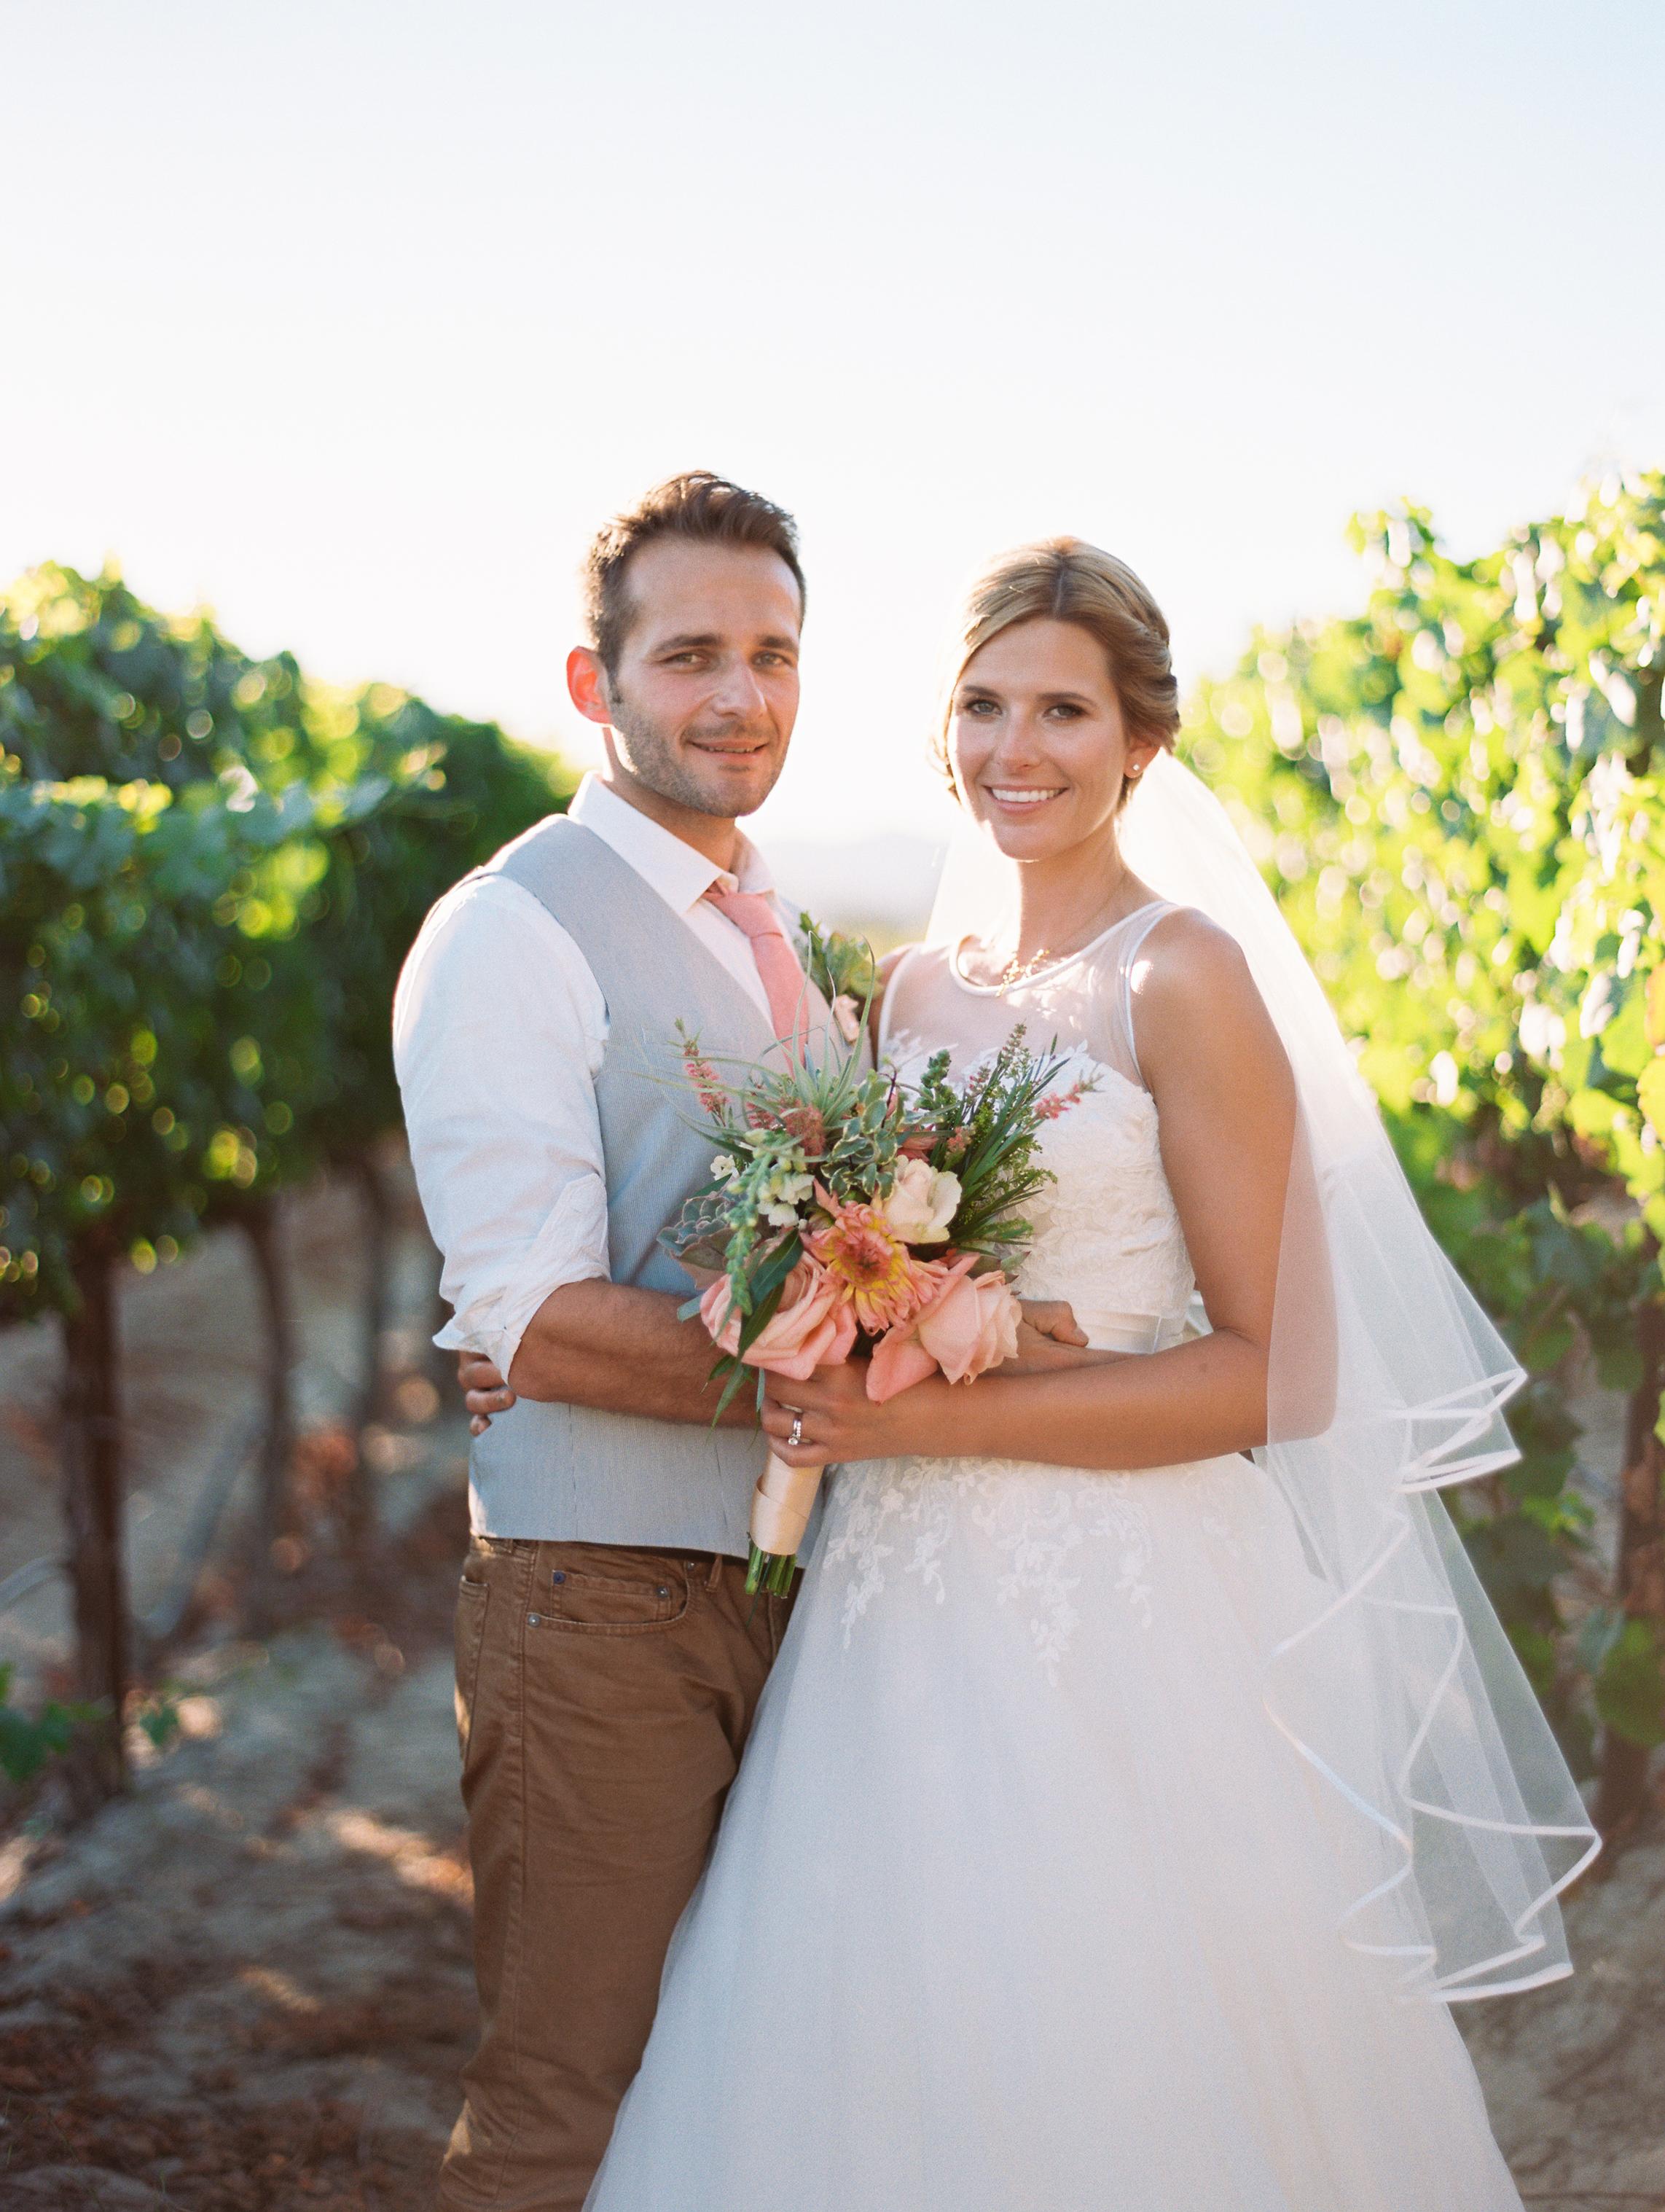 Anders Wedding by Jessica Garmon-385.JPG